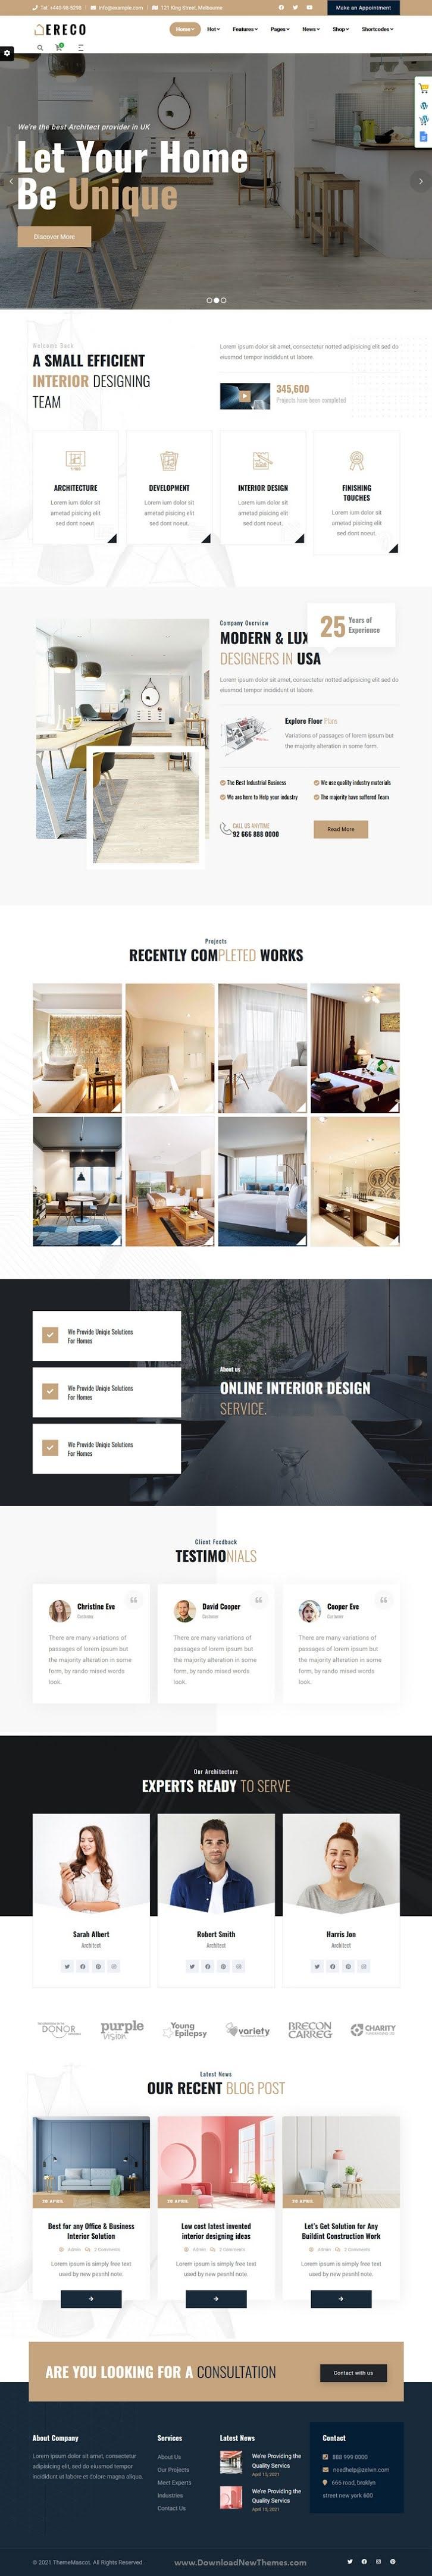 Architecture and Interior Design Website Template